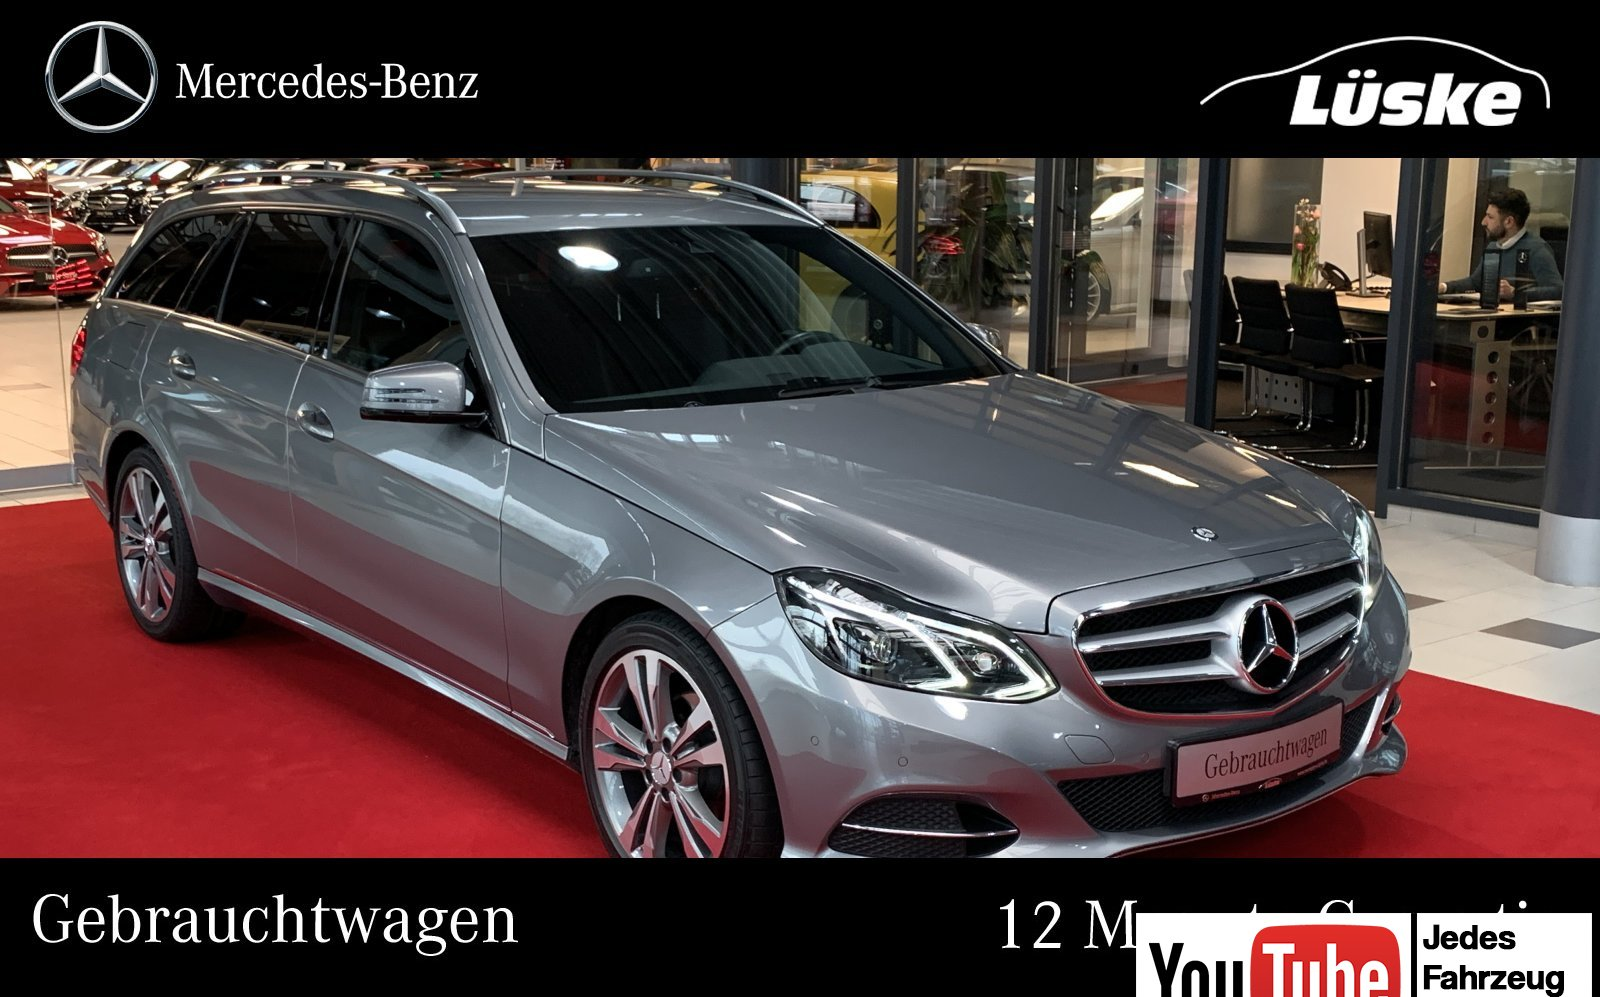 Mercedes-Benz E 220 T CDI AVANTGARDE LED Intelligent Light SHZ, Jahr 2014, Diesel